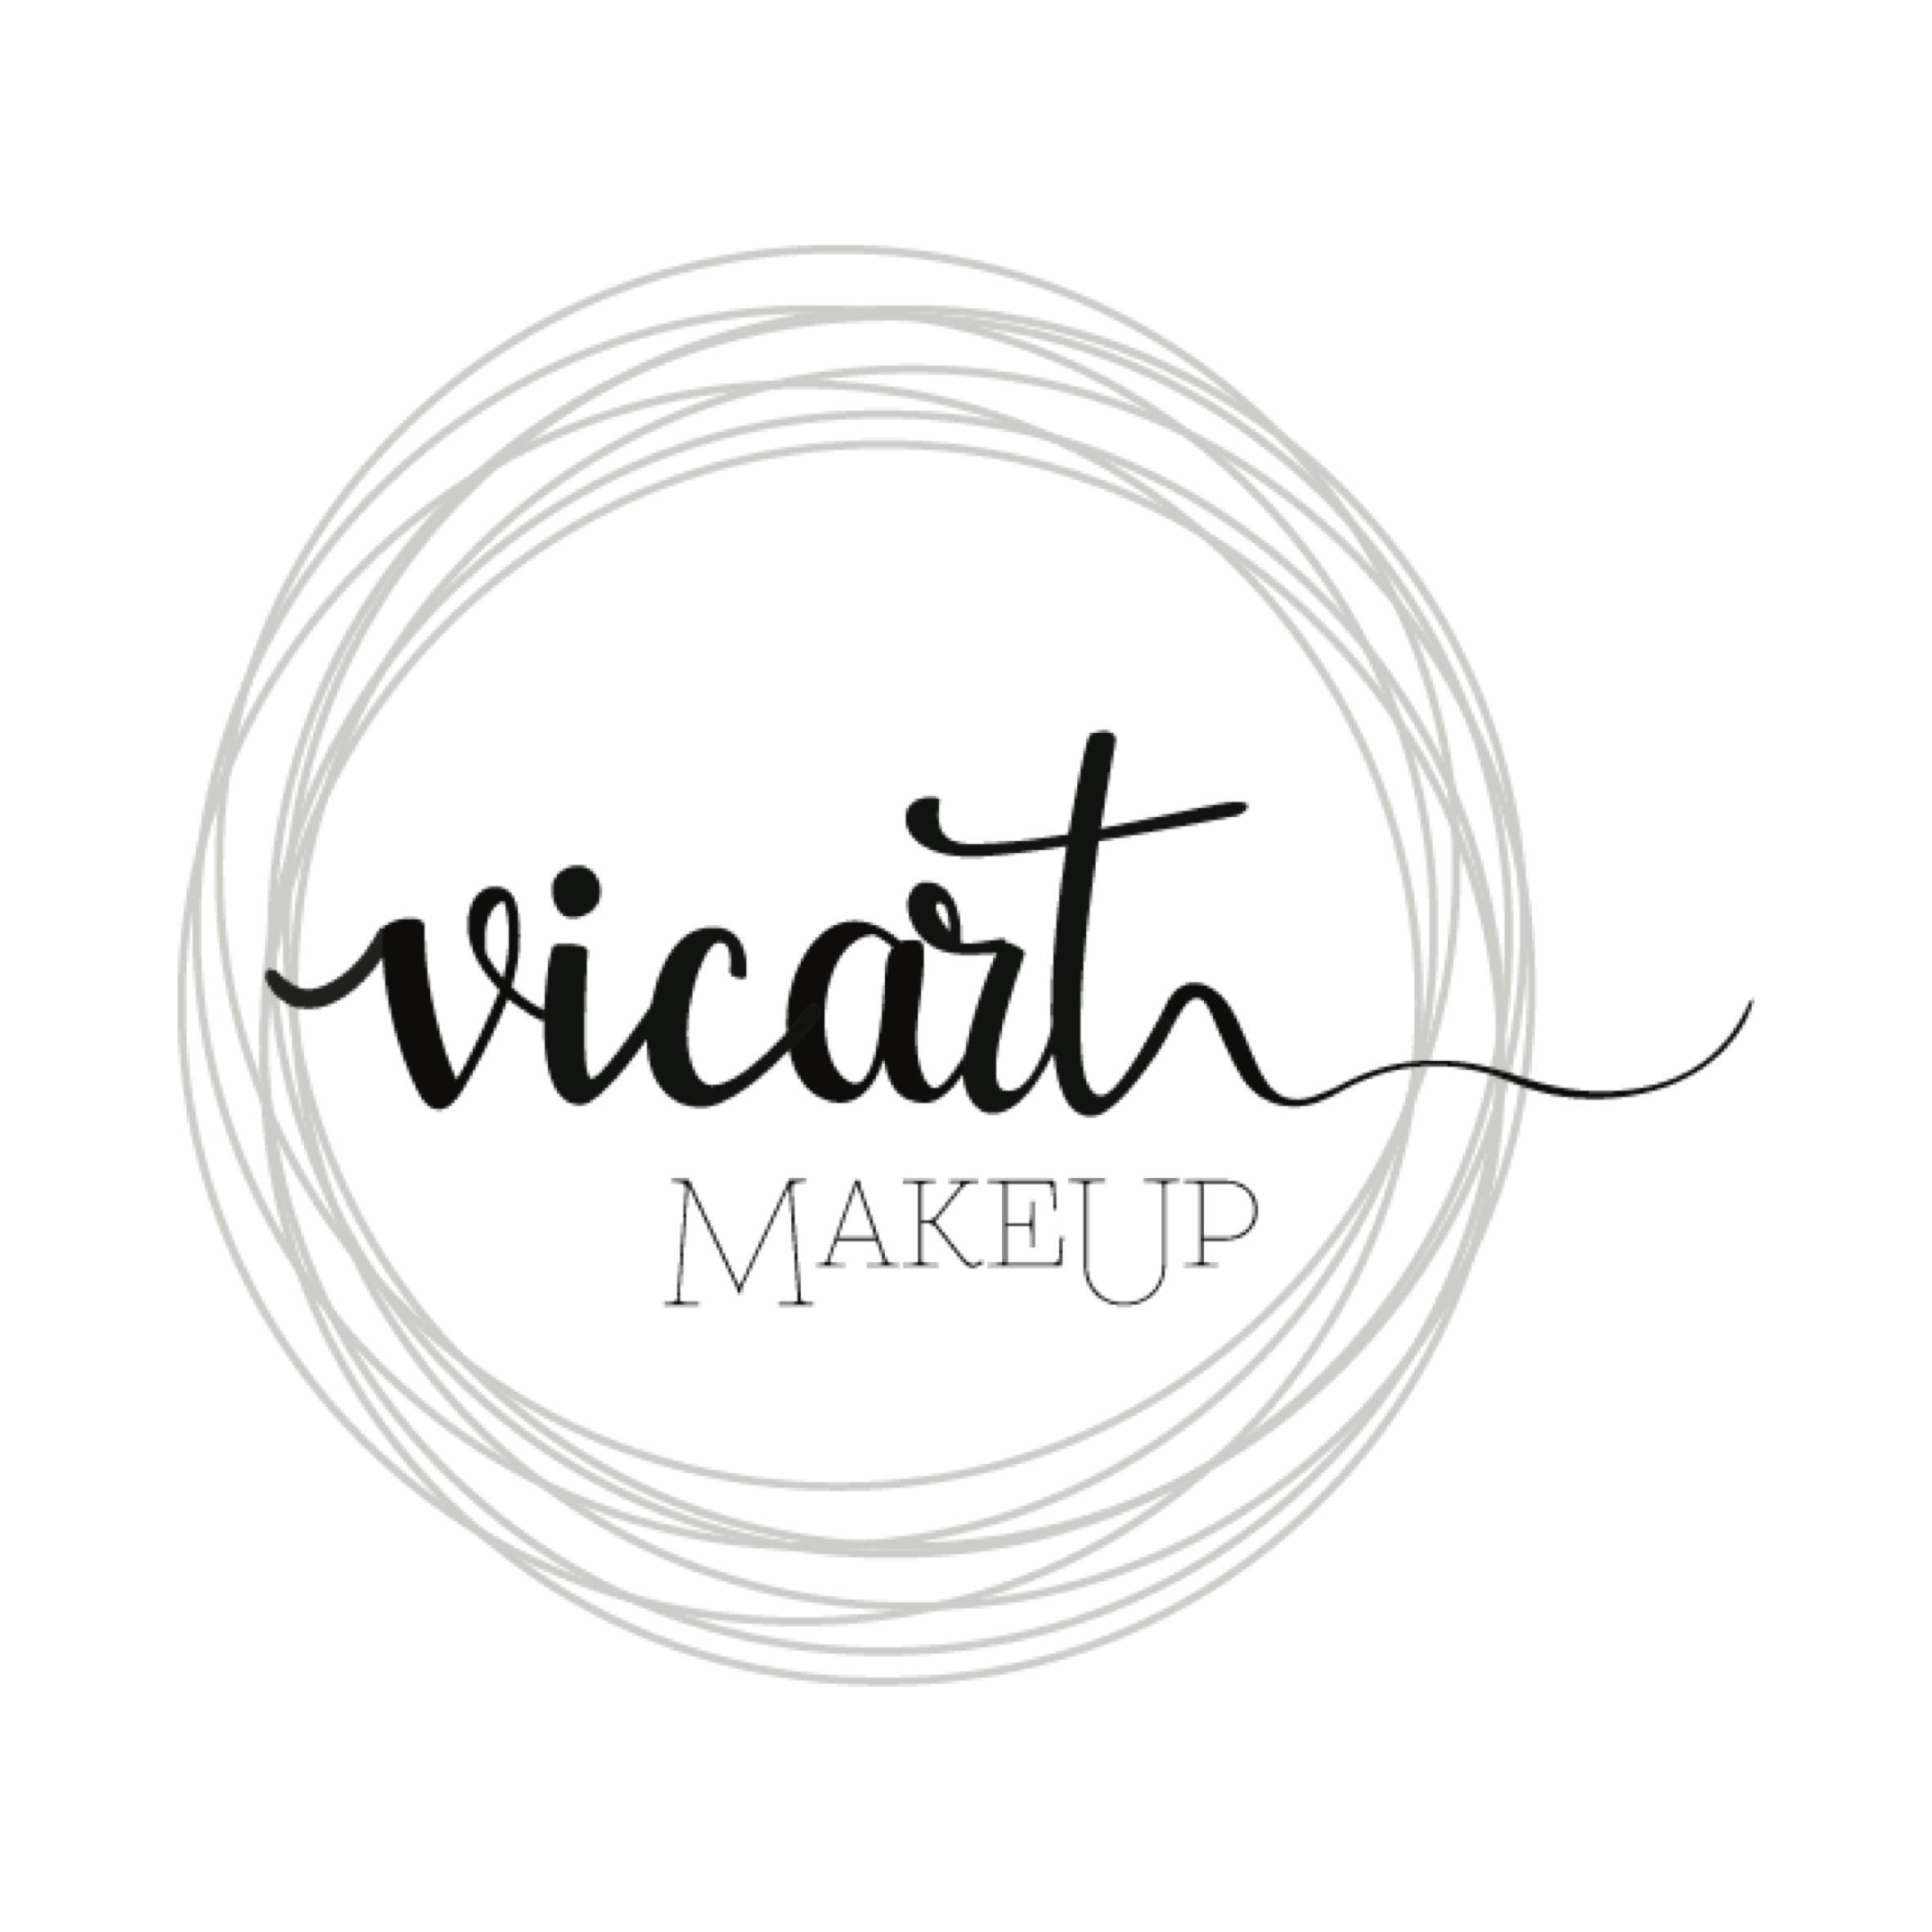 vicart